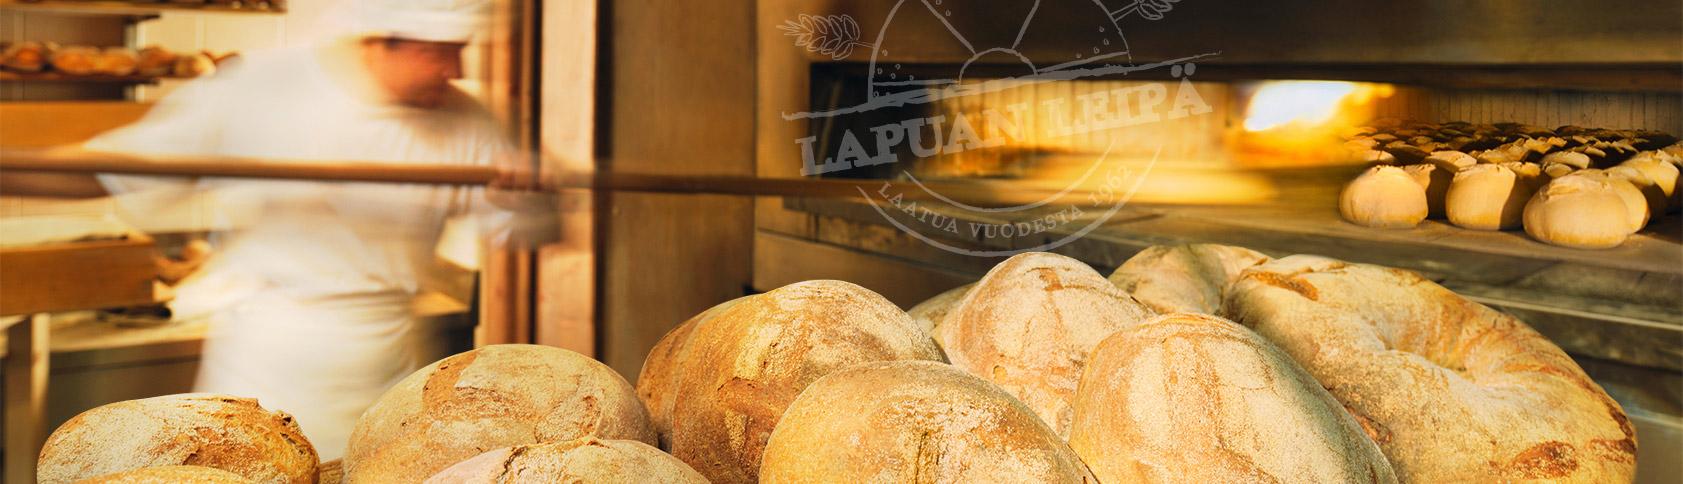 lapuan leipä